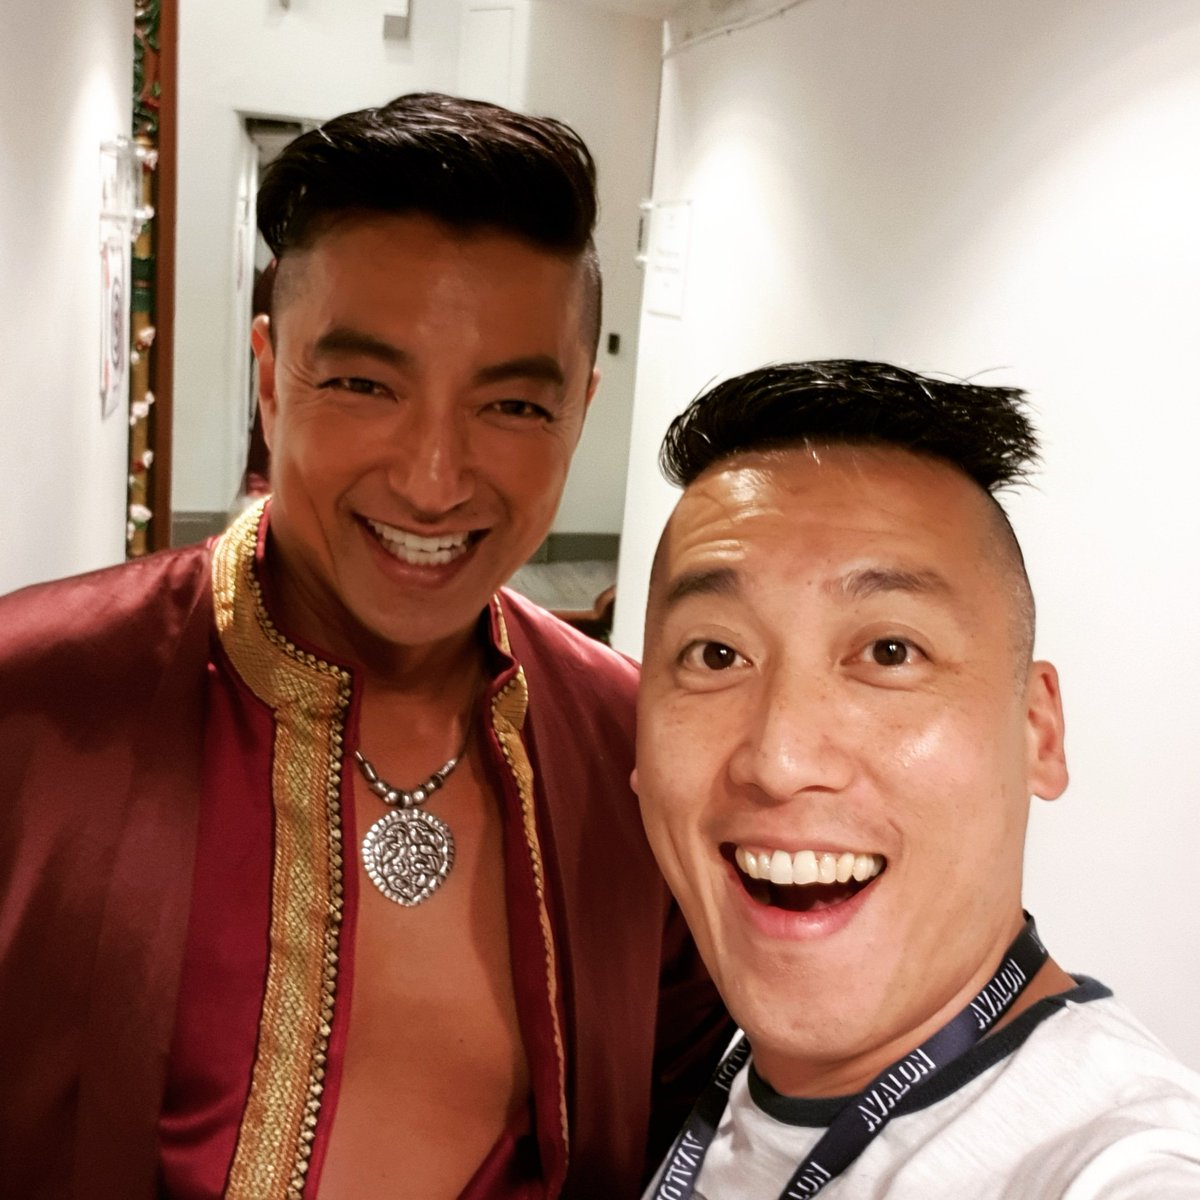 Brothers in hair!!! Takao!!! #preview #rehearsals #standbyking #work #london #actor #actorslife #workingactor #theatre #musical #westend #musicaltheatre #kingandi #rodgersandhammerstein #KingandIWestEnd #gettingtoknowyou @Takao_Osawa @LondonPalladium #takaoosawa #大沢たかお<br>http://pic.twitter.com/nKnicYuEut